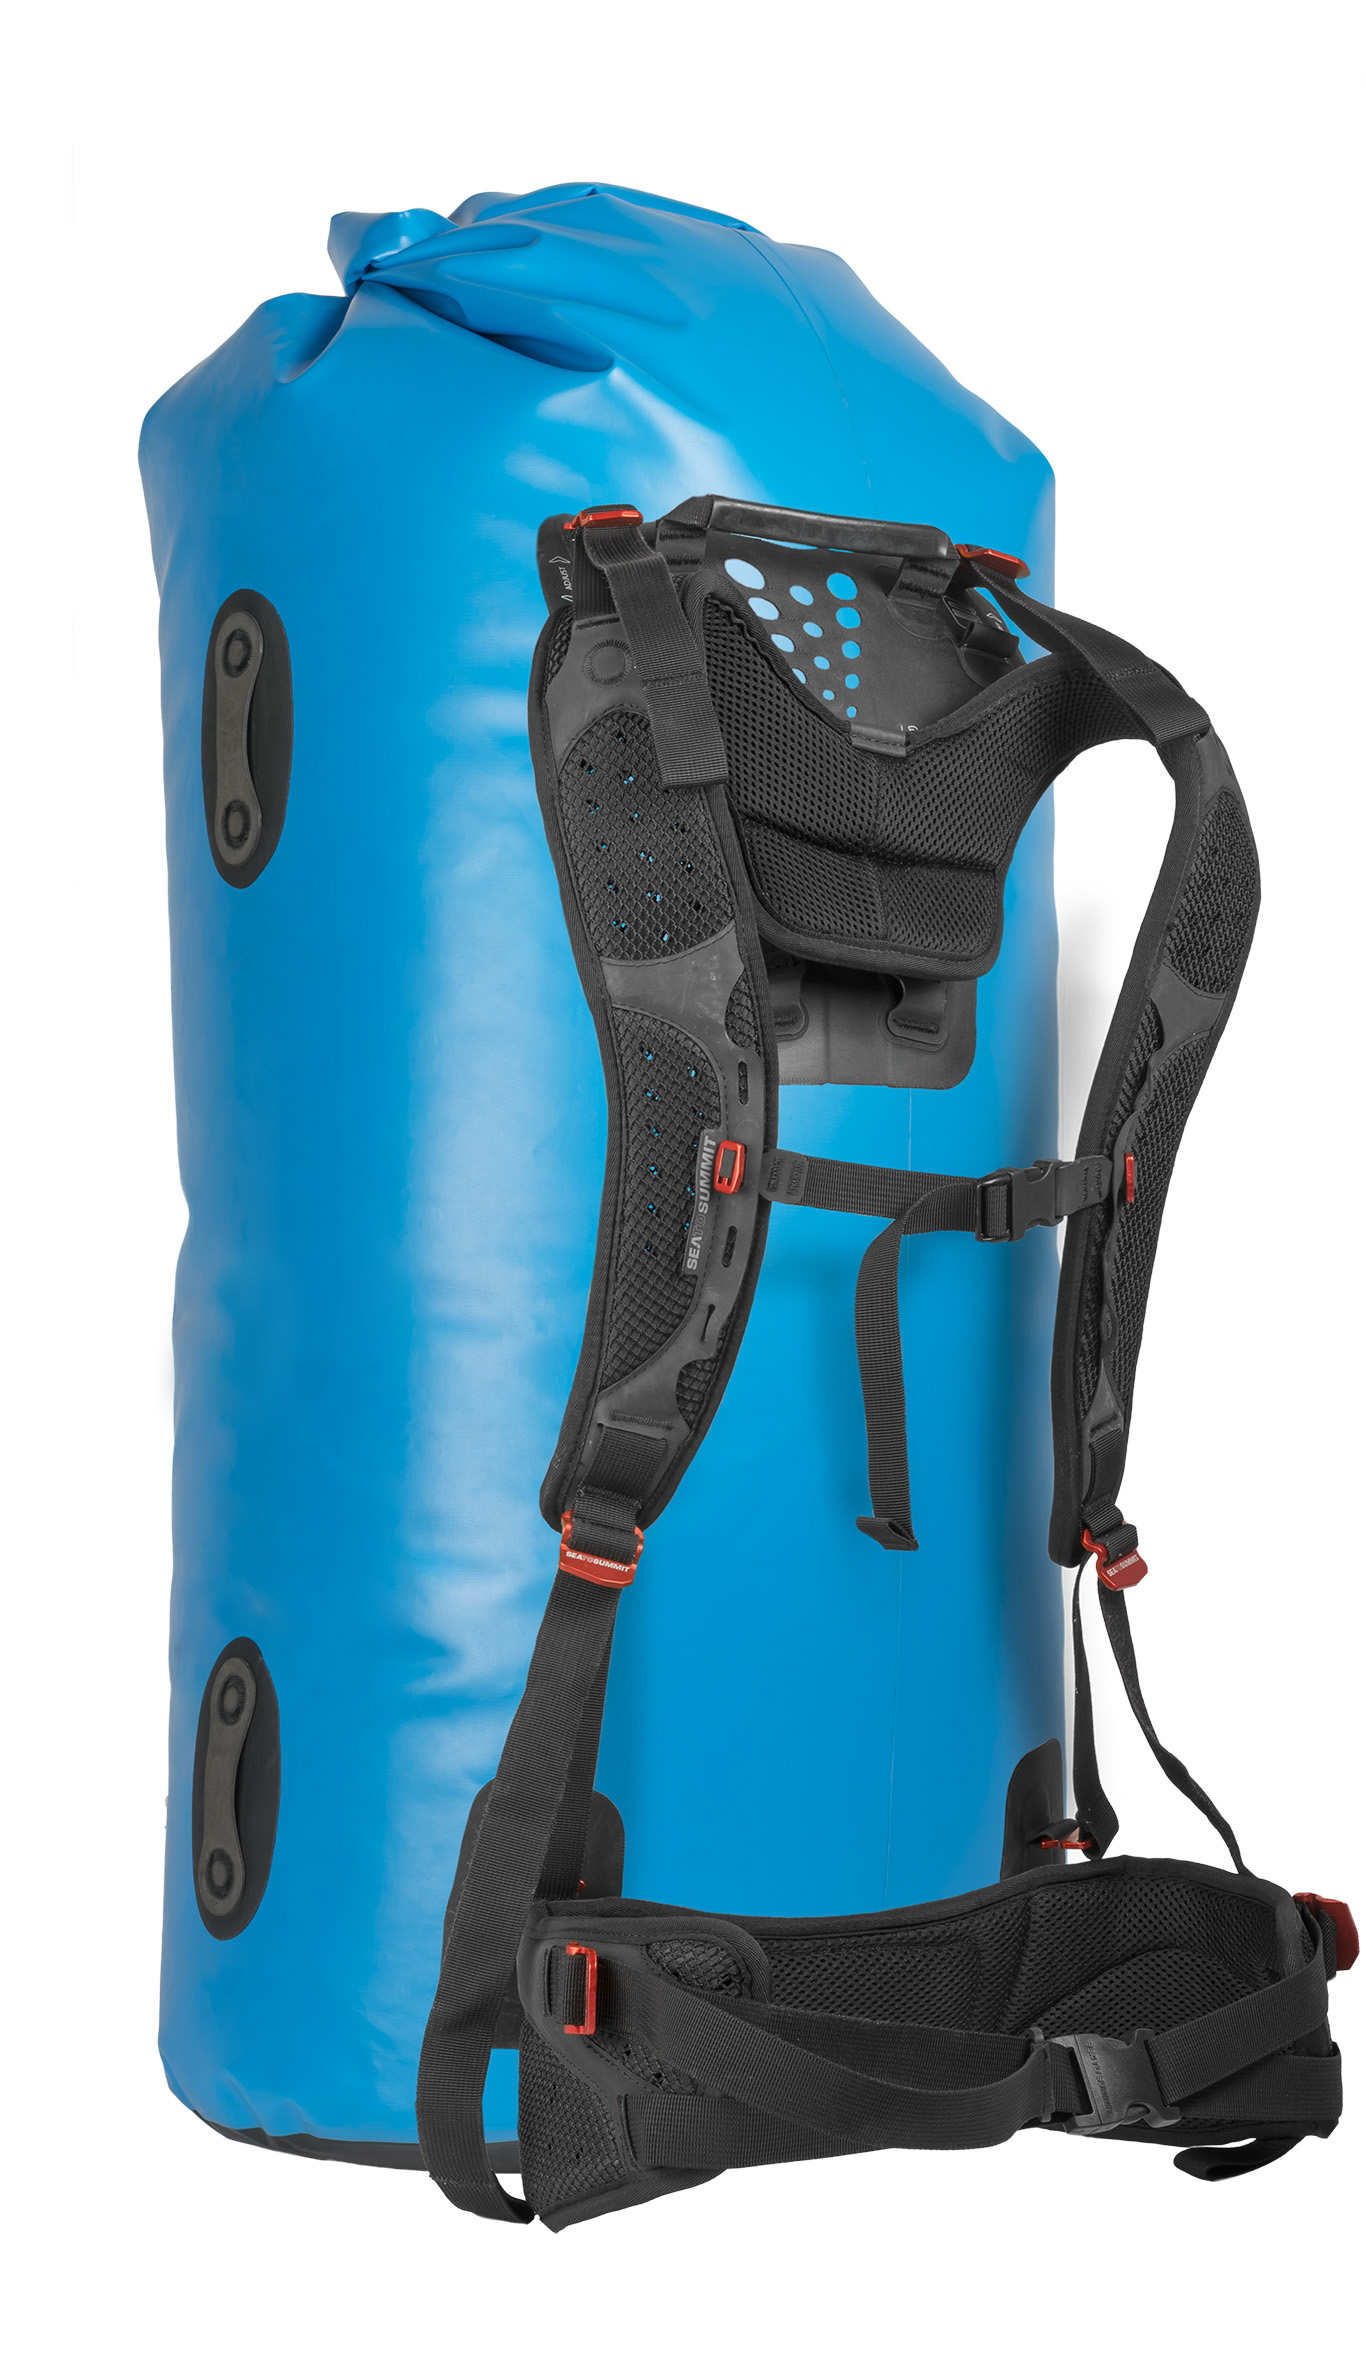 Sea to Summit Hydraulic Dry Bag 35 L mit abnehmbarem Rückenpanel blue